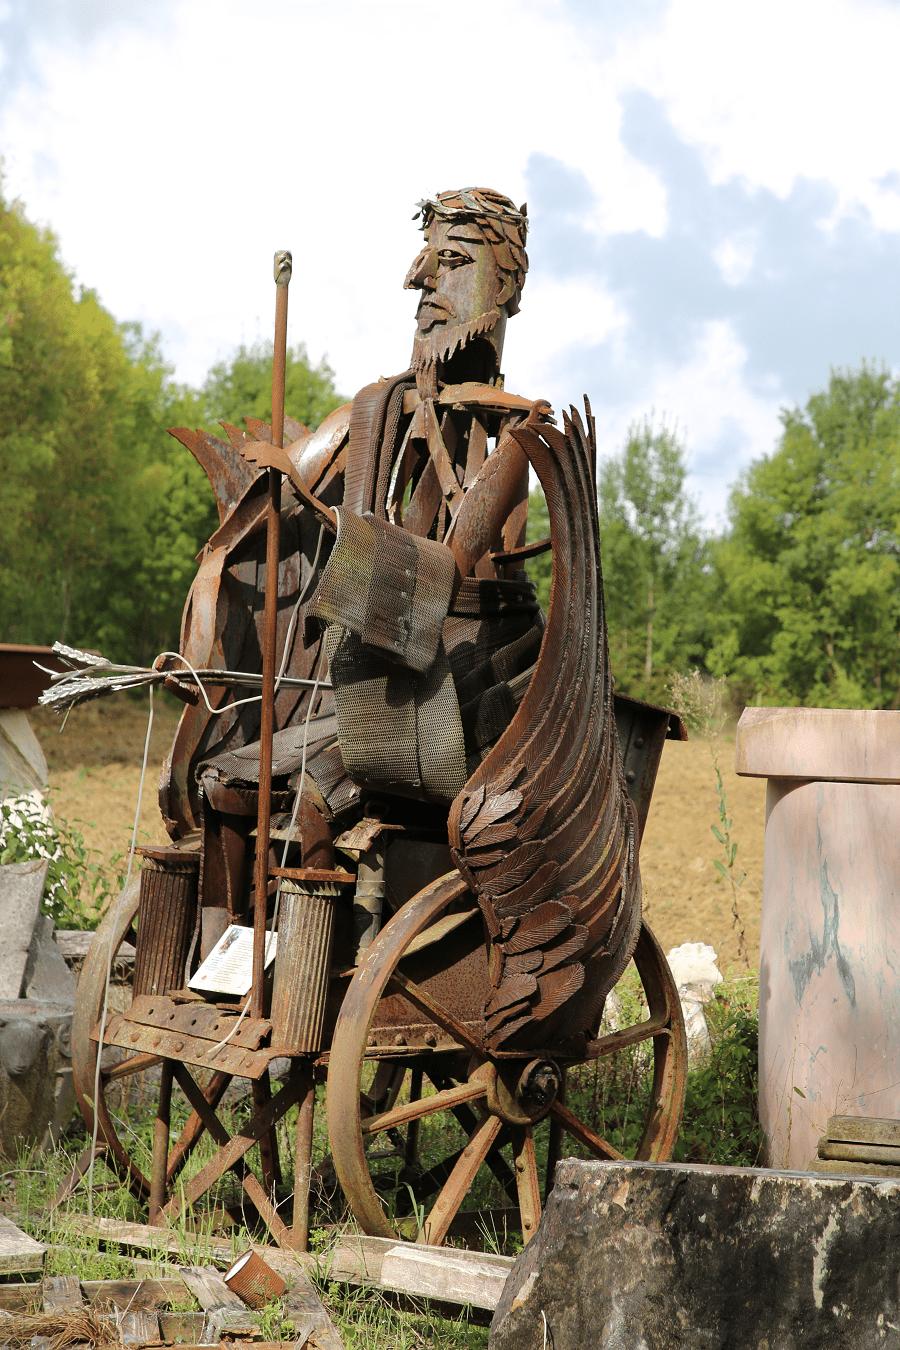 Кристиан Бо - скульптуры из металла, город Демю. Франция